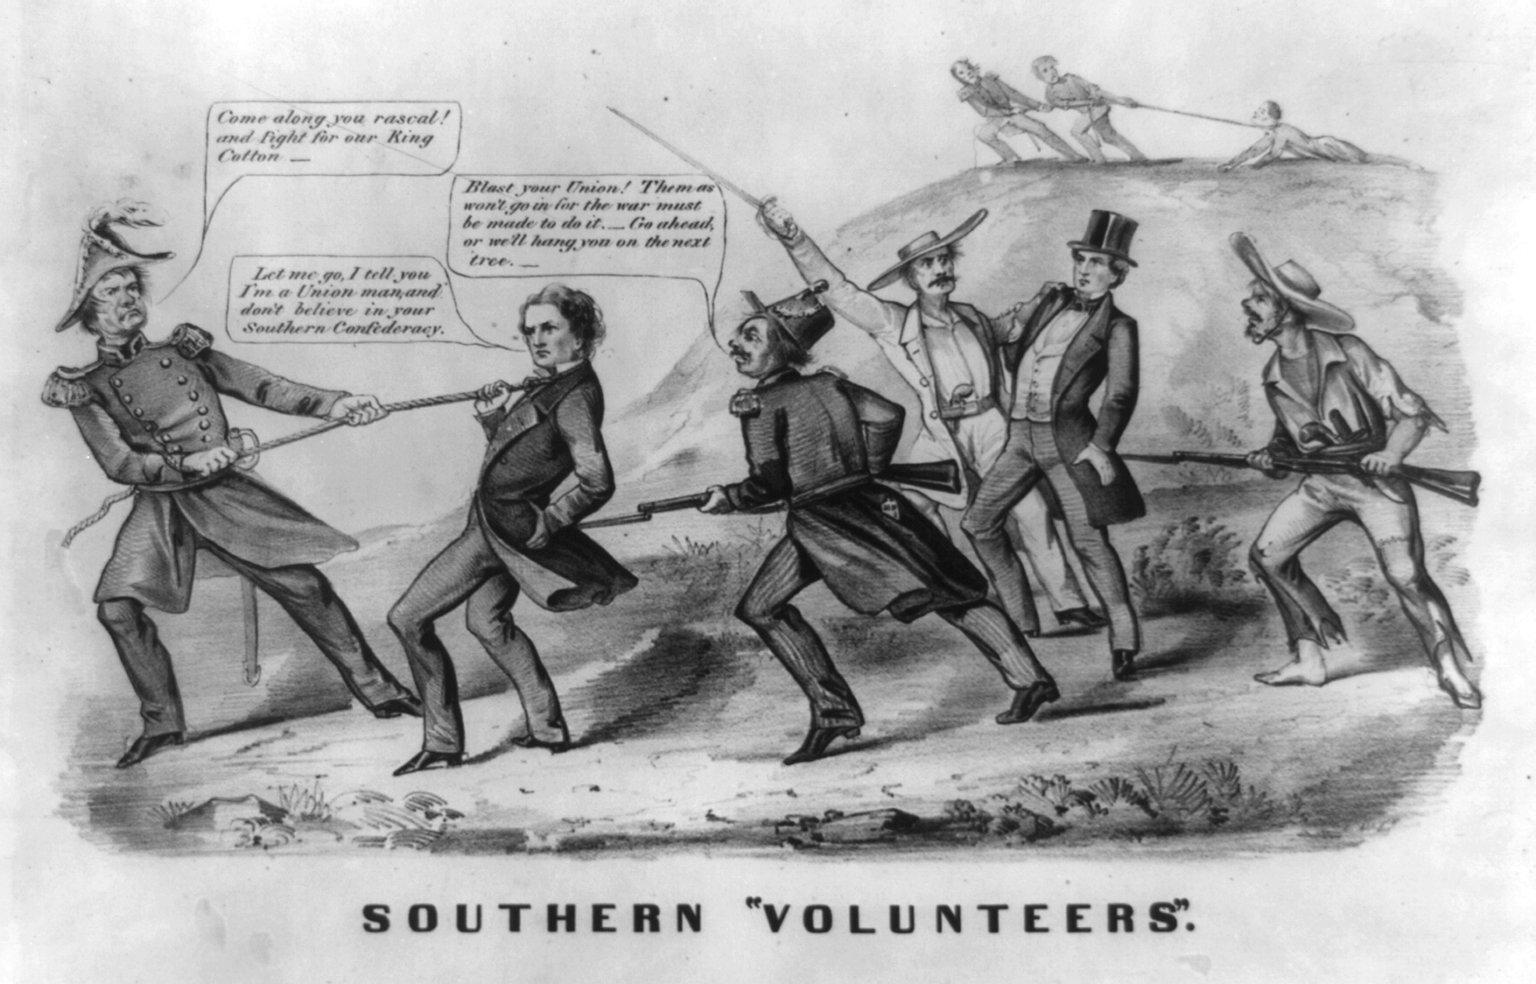 CSA Confederate General Braxton Bragg New Civil War Photo 6 Sizes!